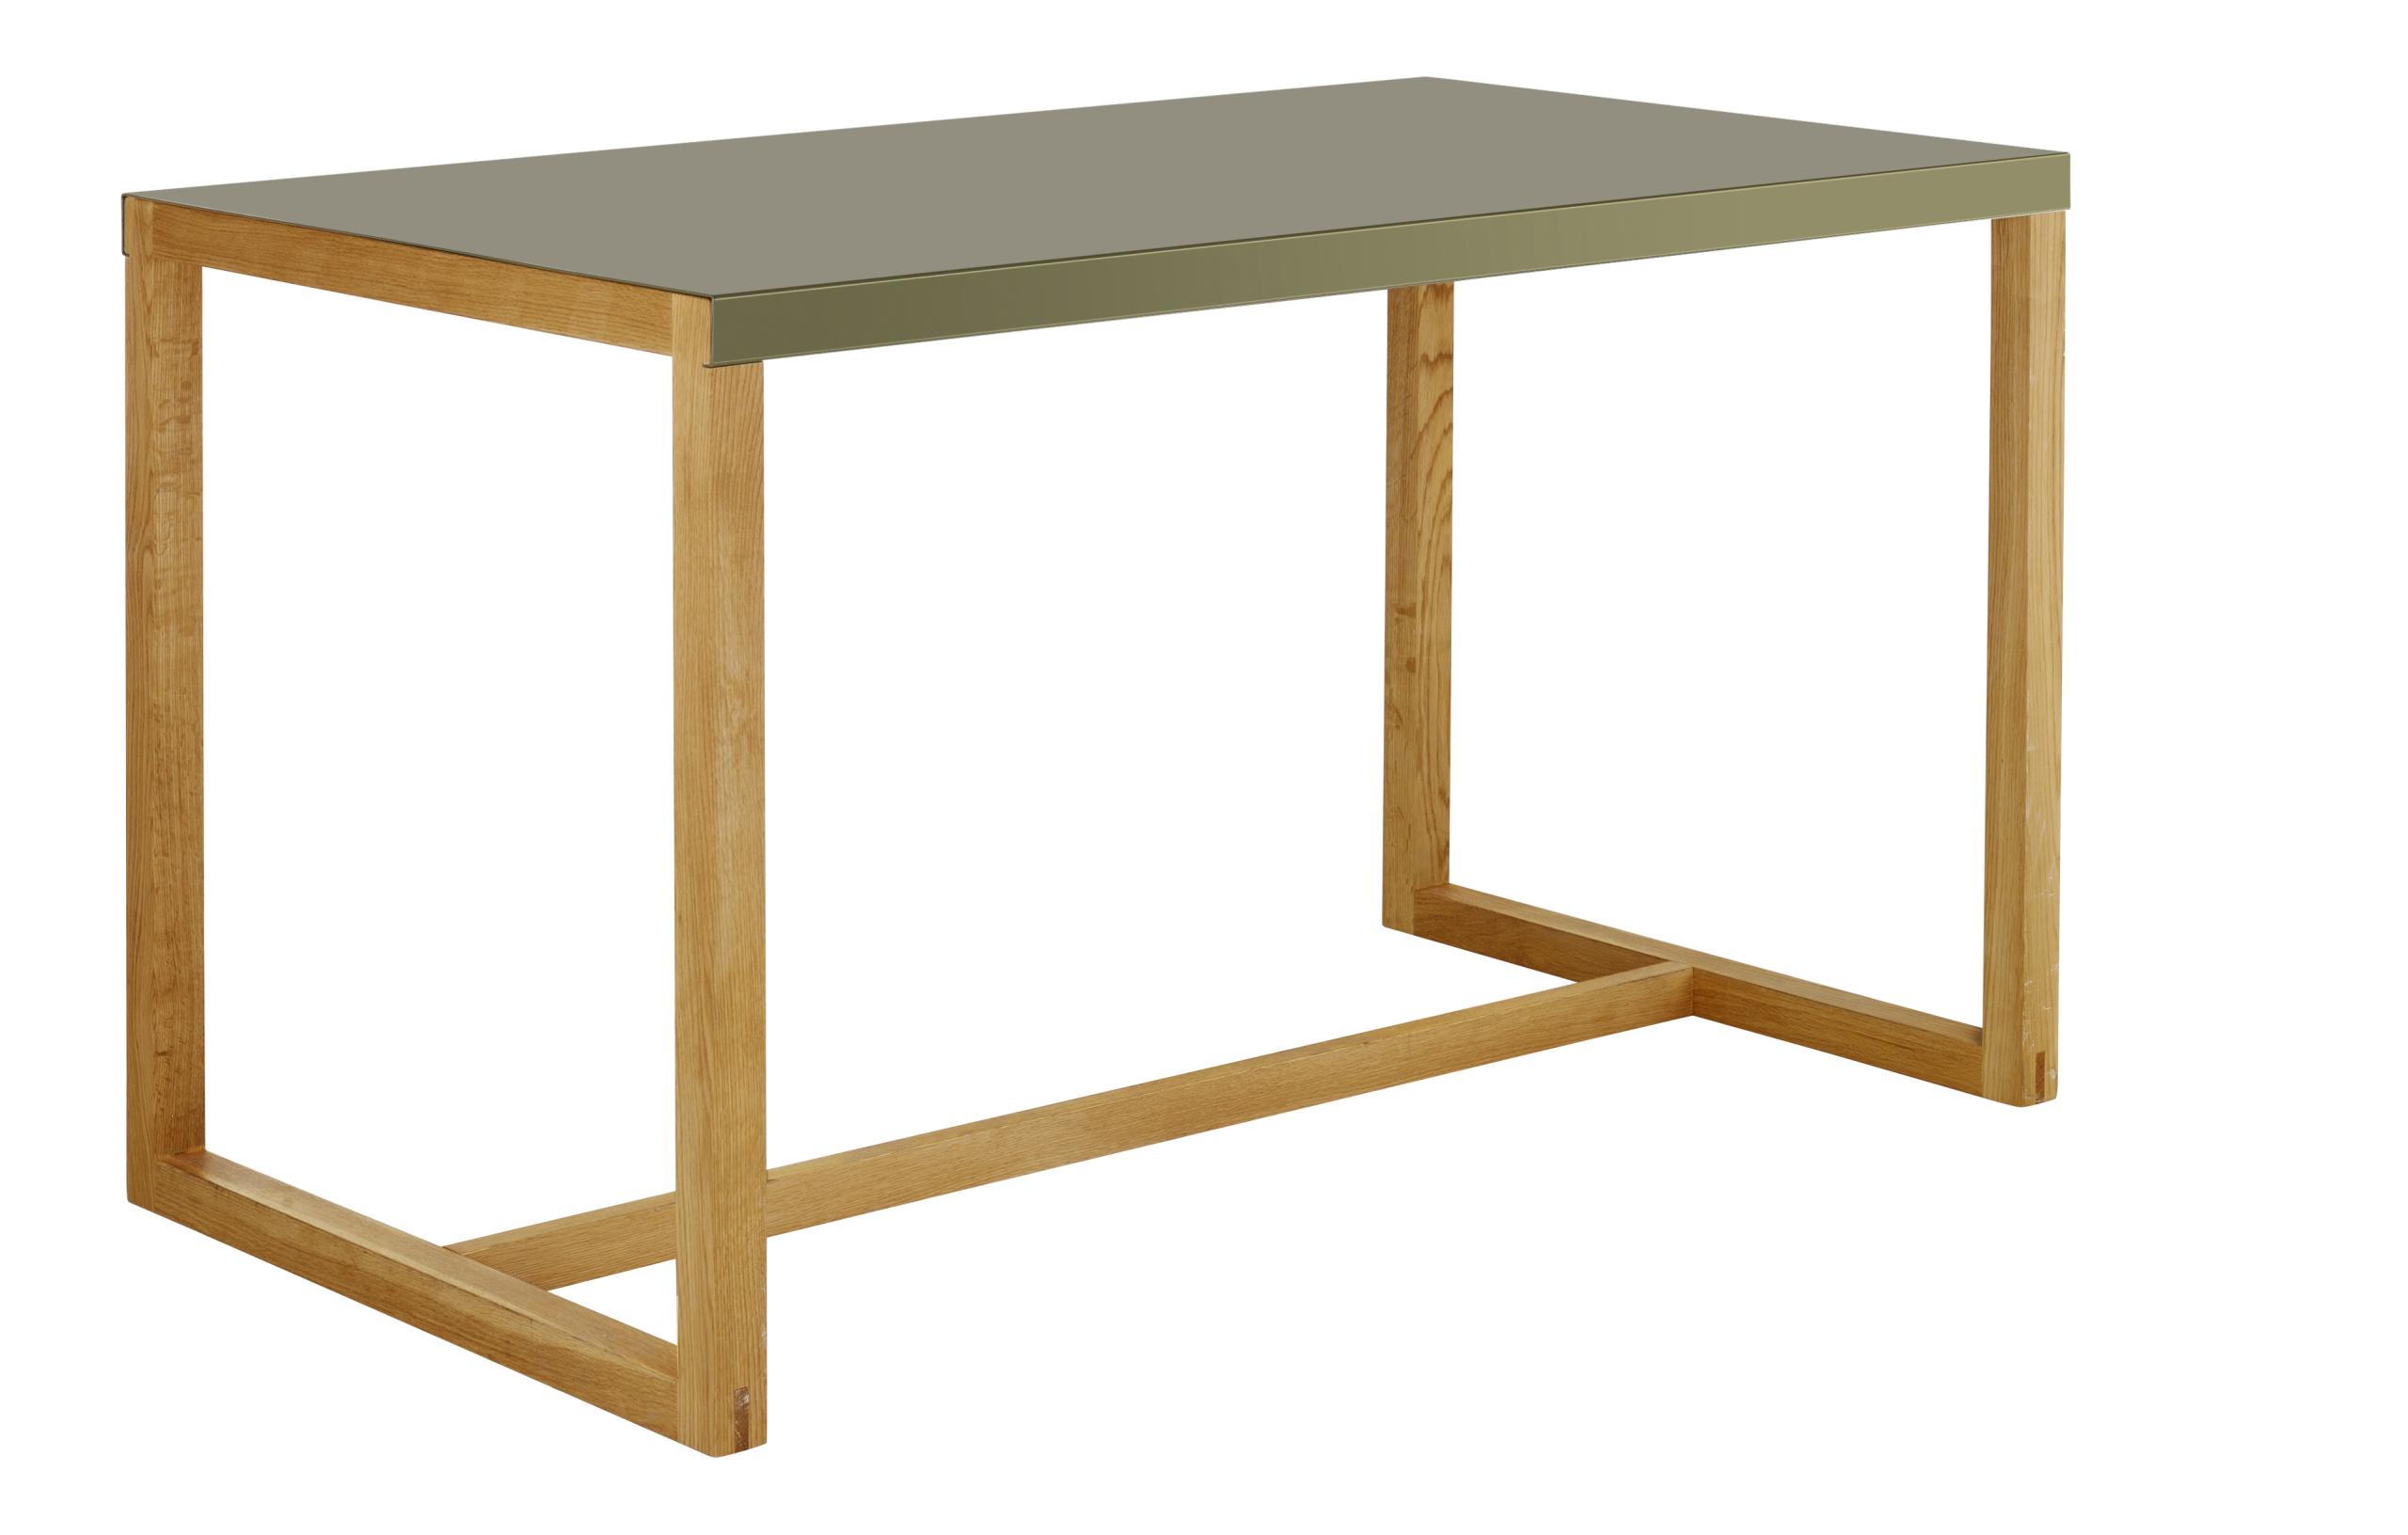 discover kilo dining room tables olive green wood metal at habitat a of furniture and design. Black Bedroom Furniture Sets. Home Design Ideas